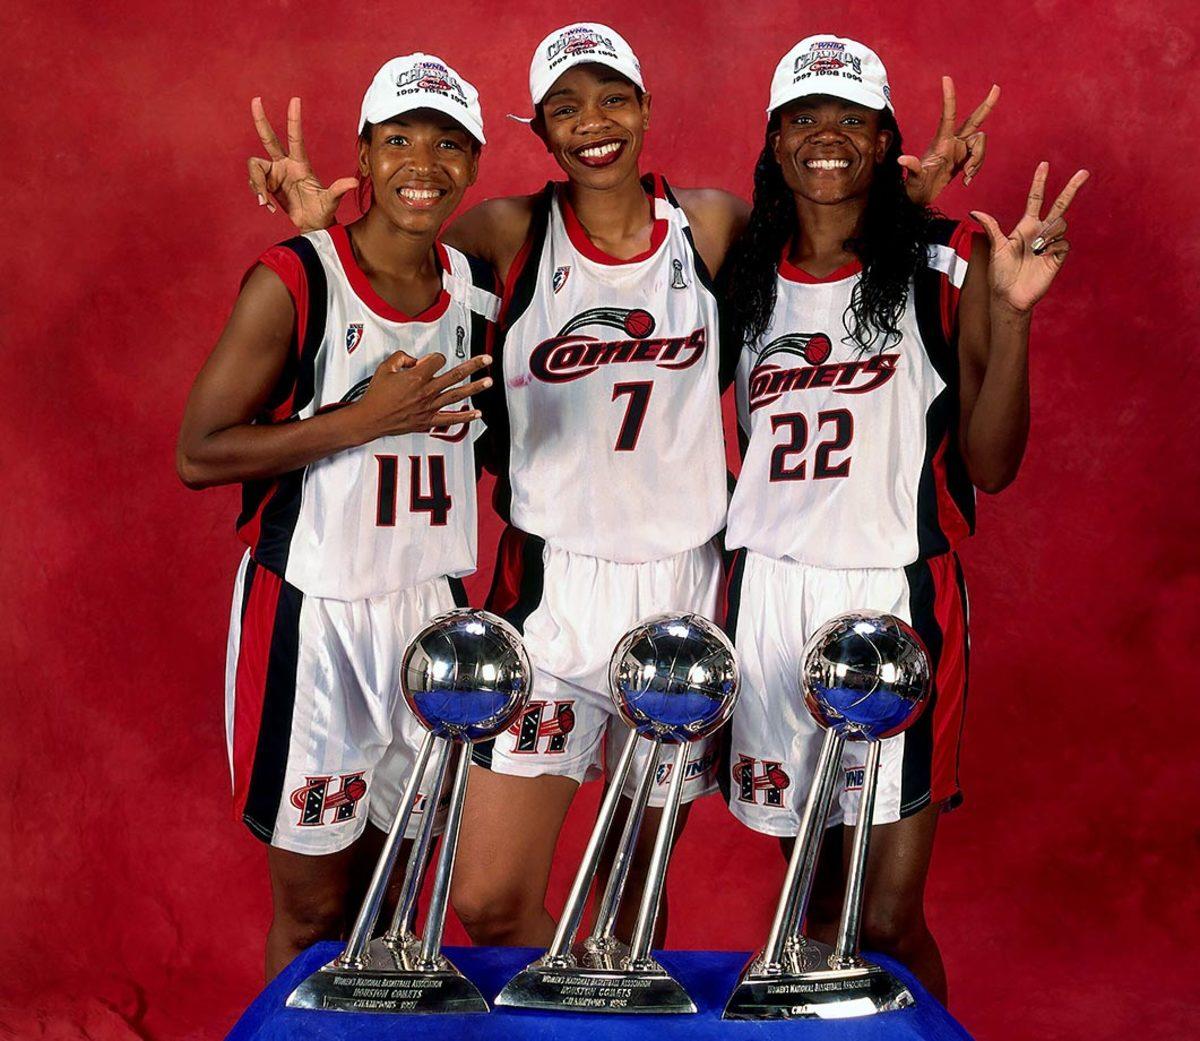 1999-Houston-Comets-Cynthia-Cooper-Tina-Thompson-Sherryl-Swoopes.jpg